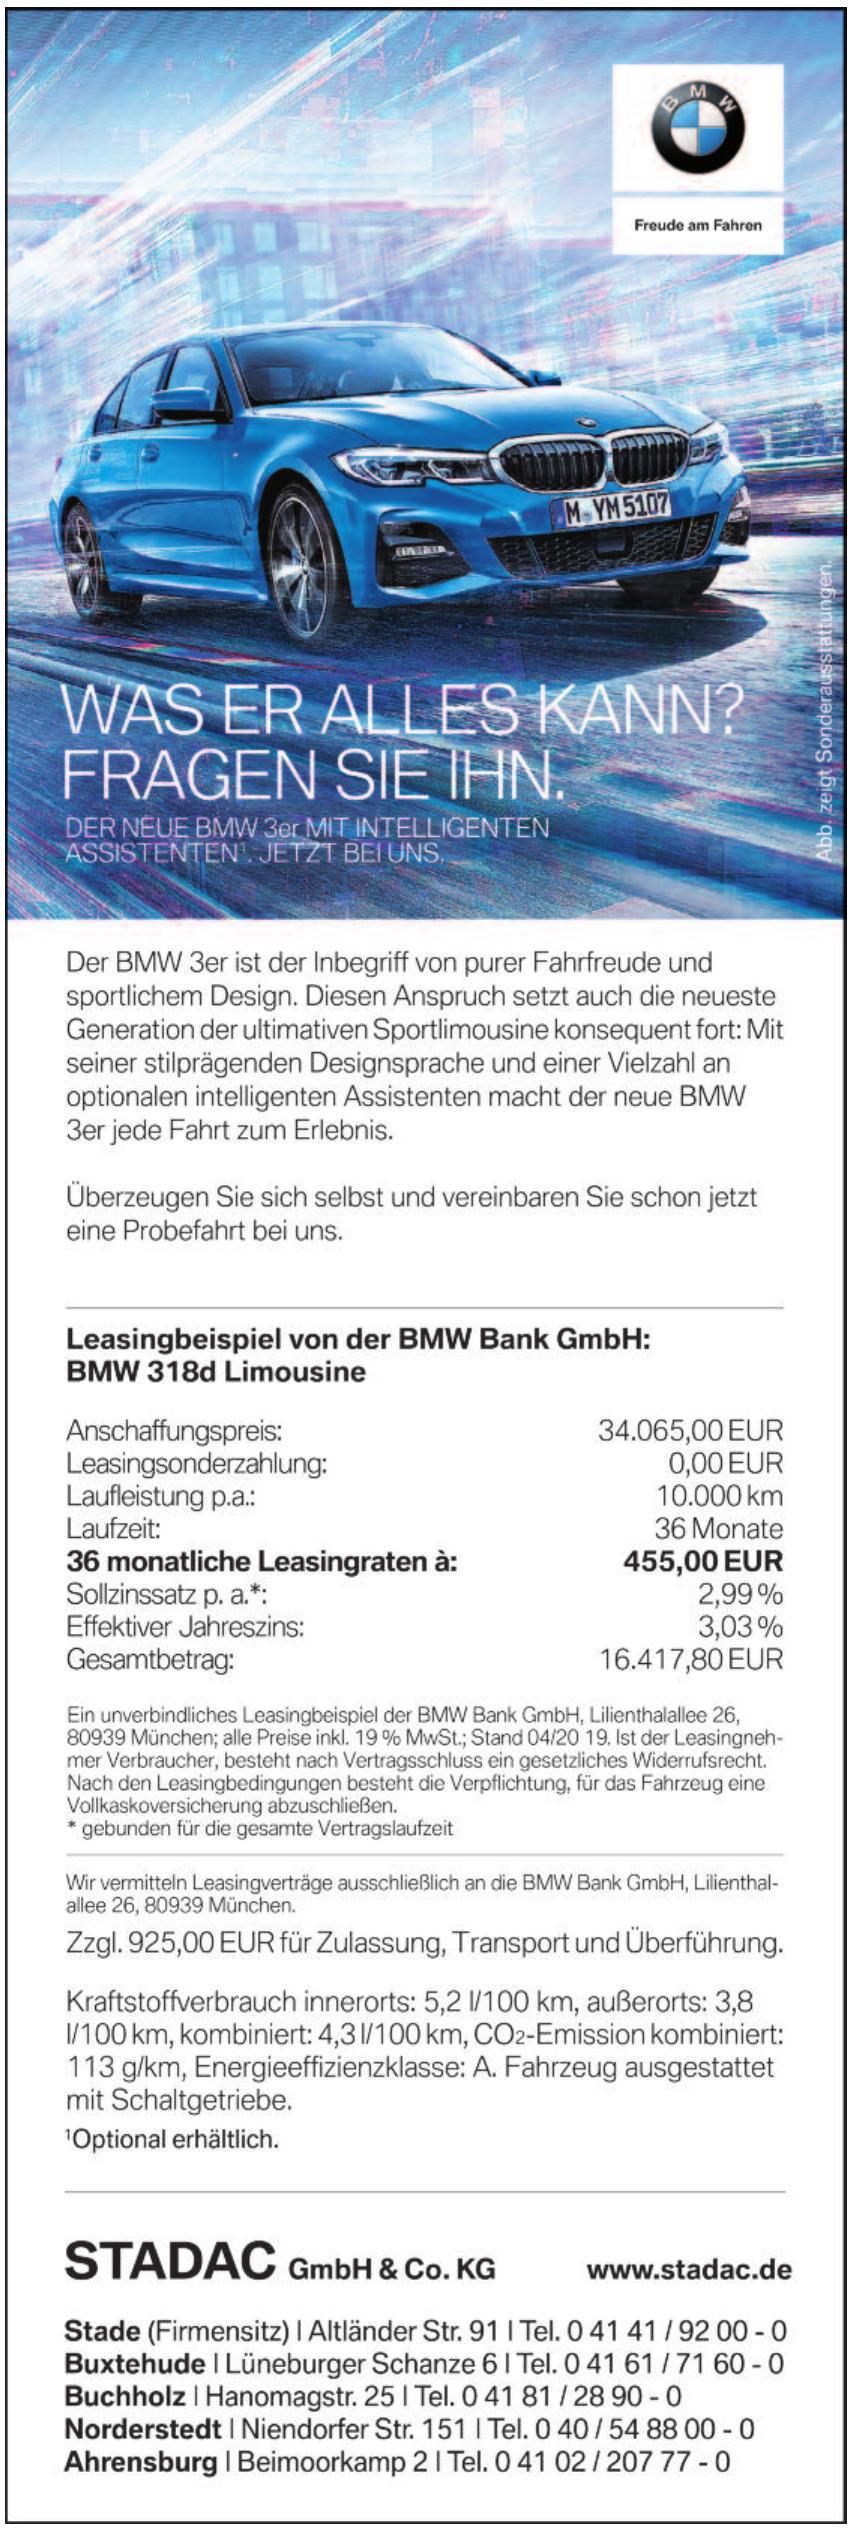 Stadac GmbH & Co. KG